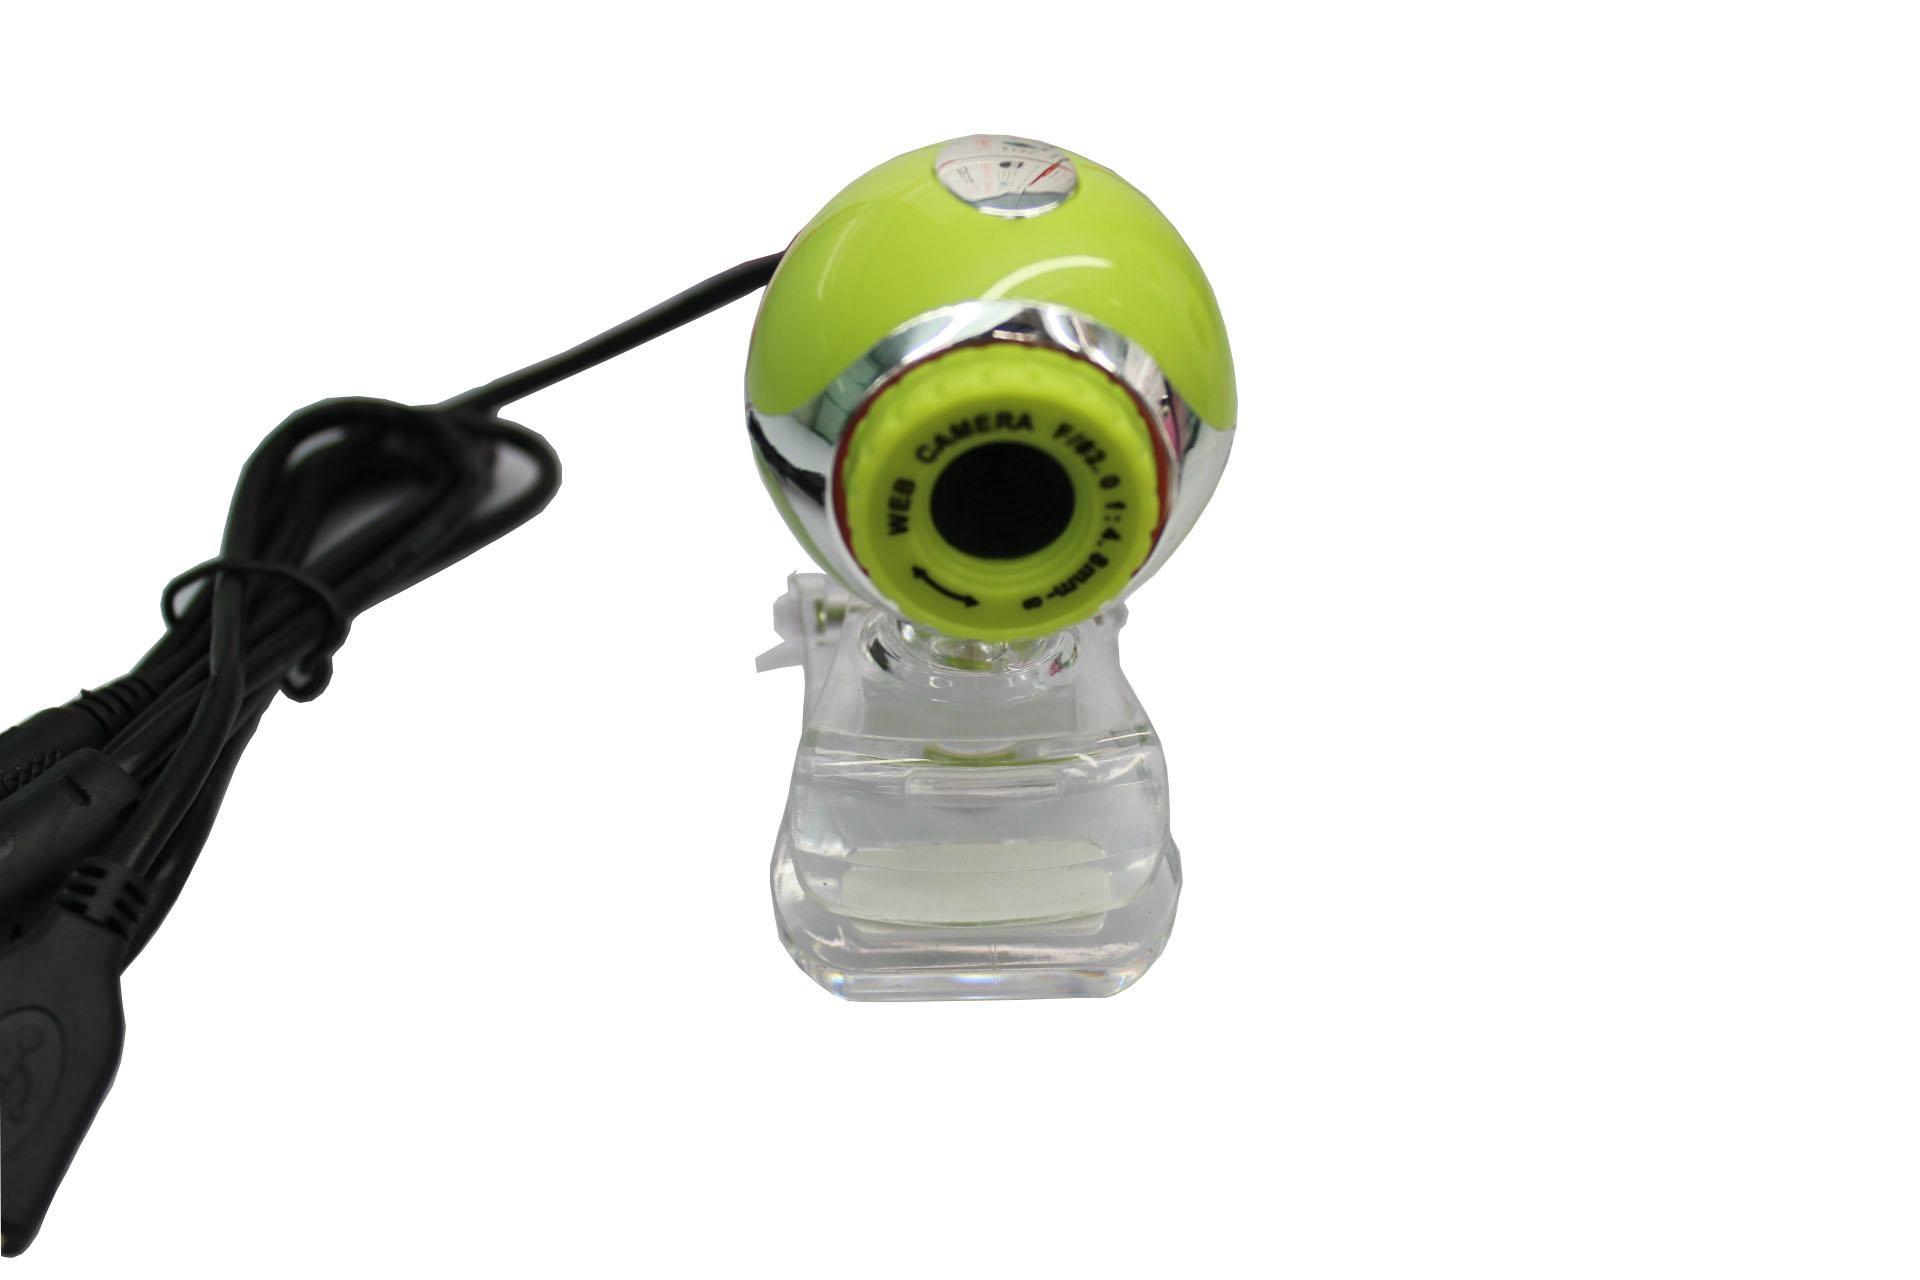 Hot selling Webcam PC loptop usb webcam with microphone /usb webcam 4